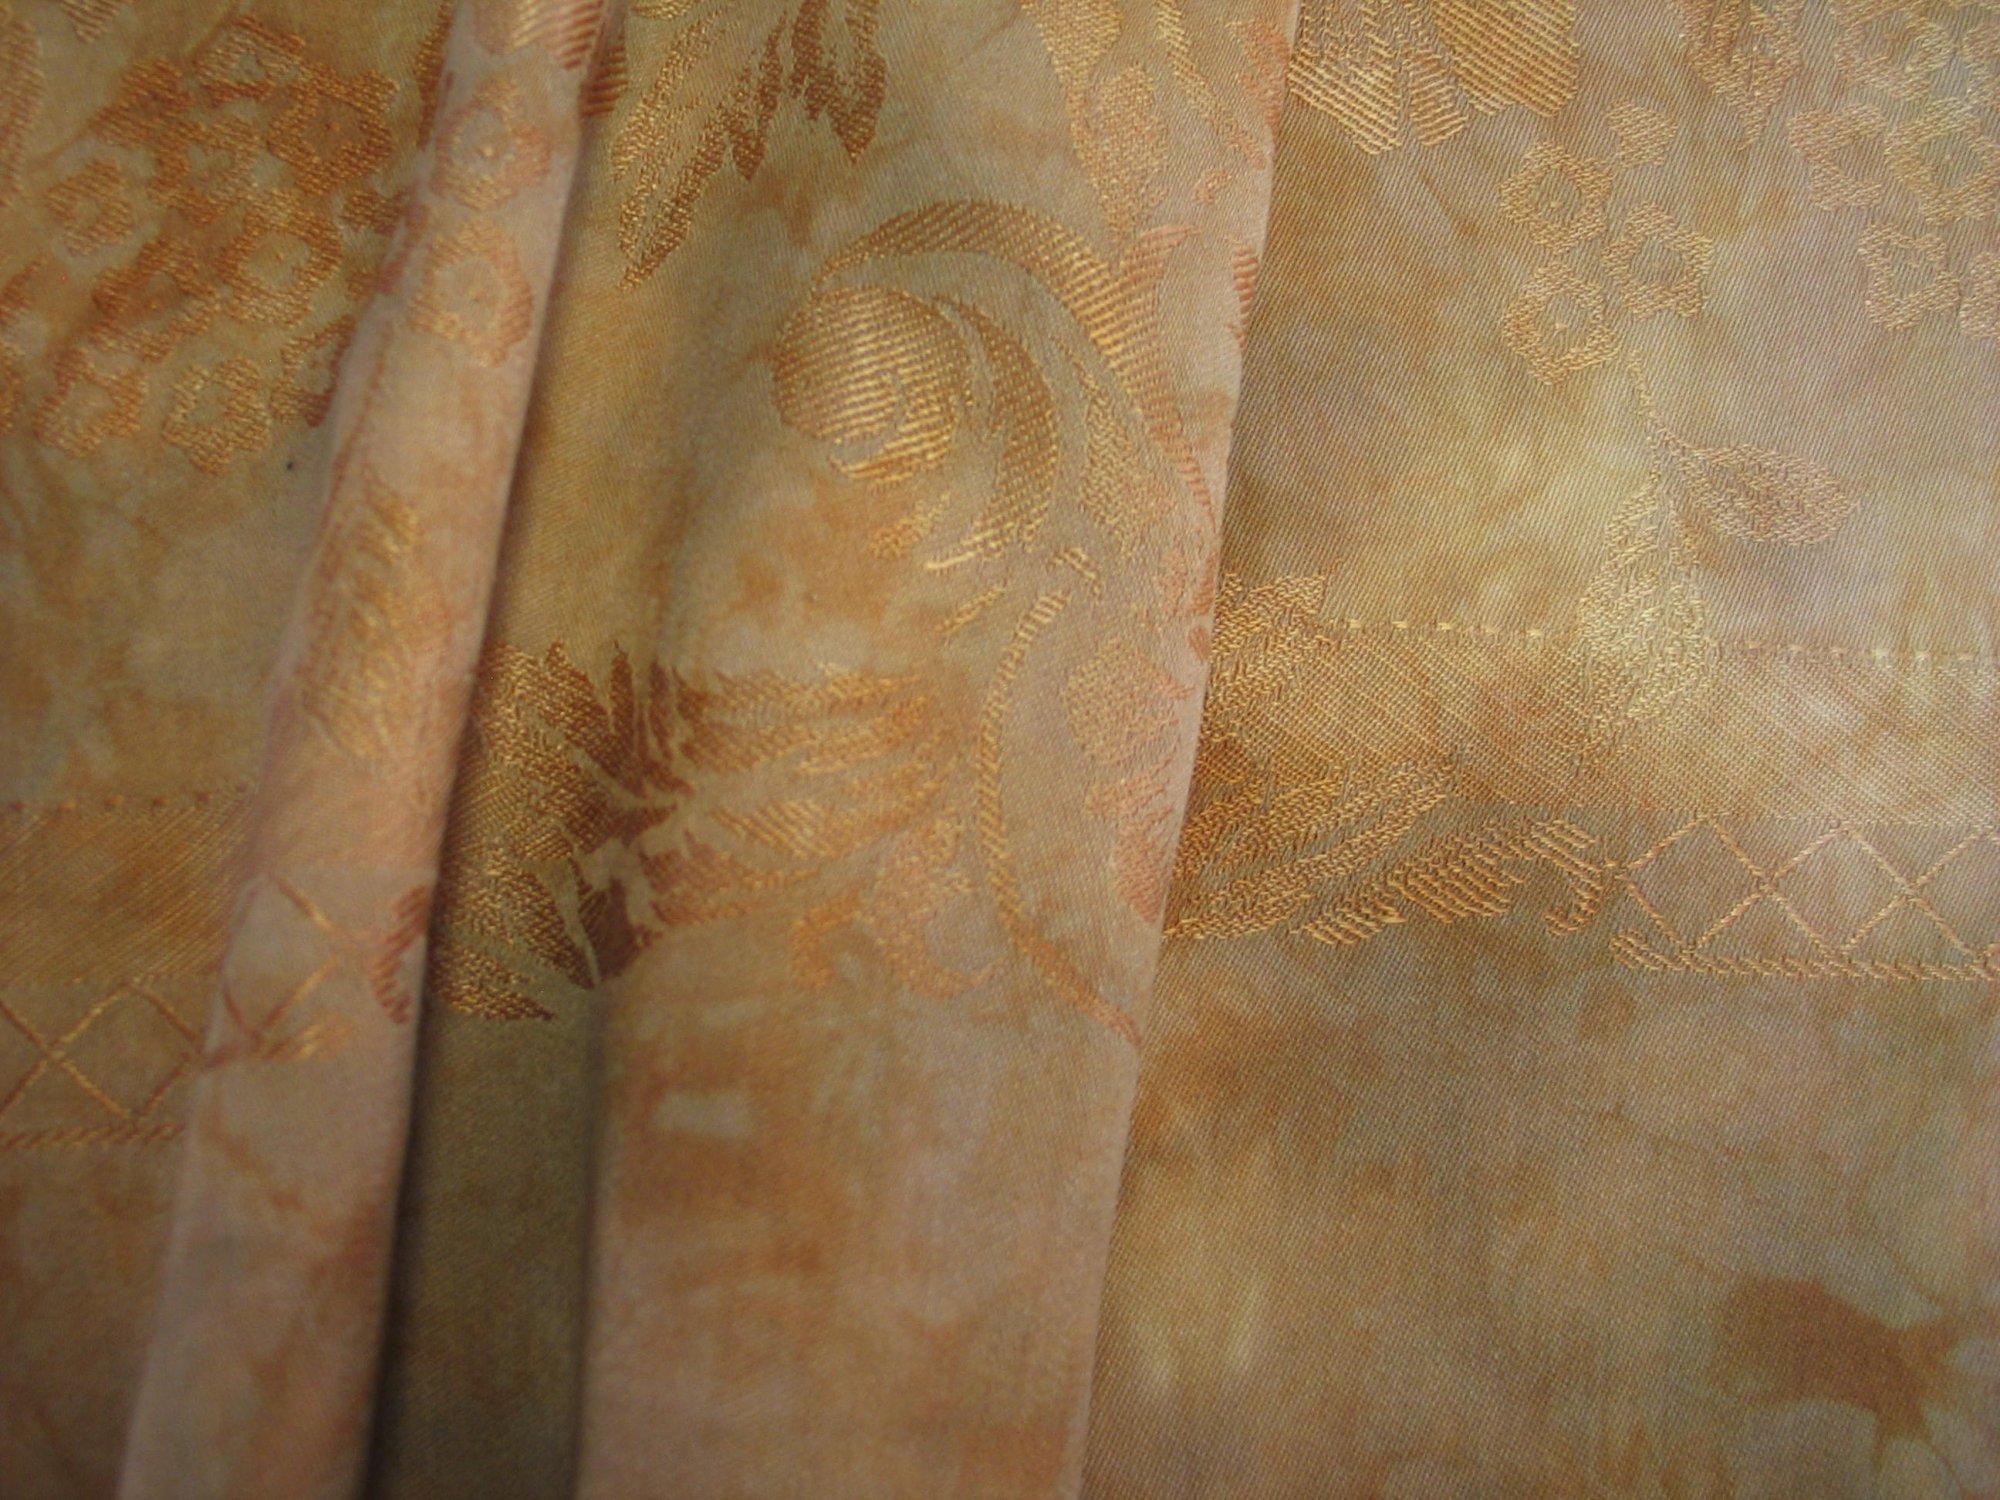 Overdyed Damask Tablecloth - Ochre